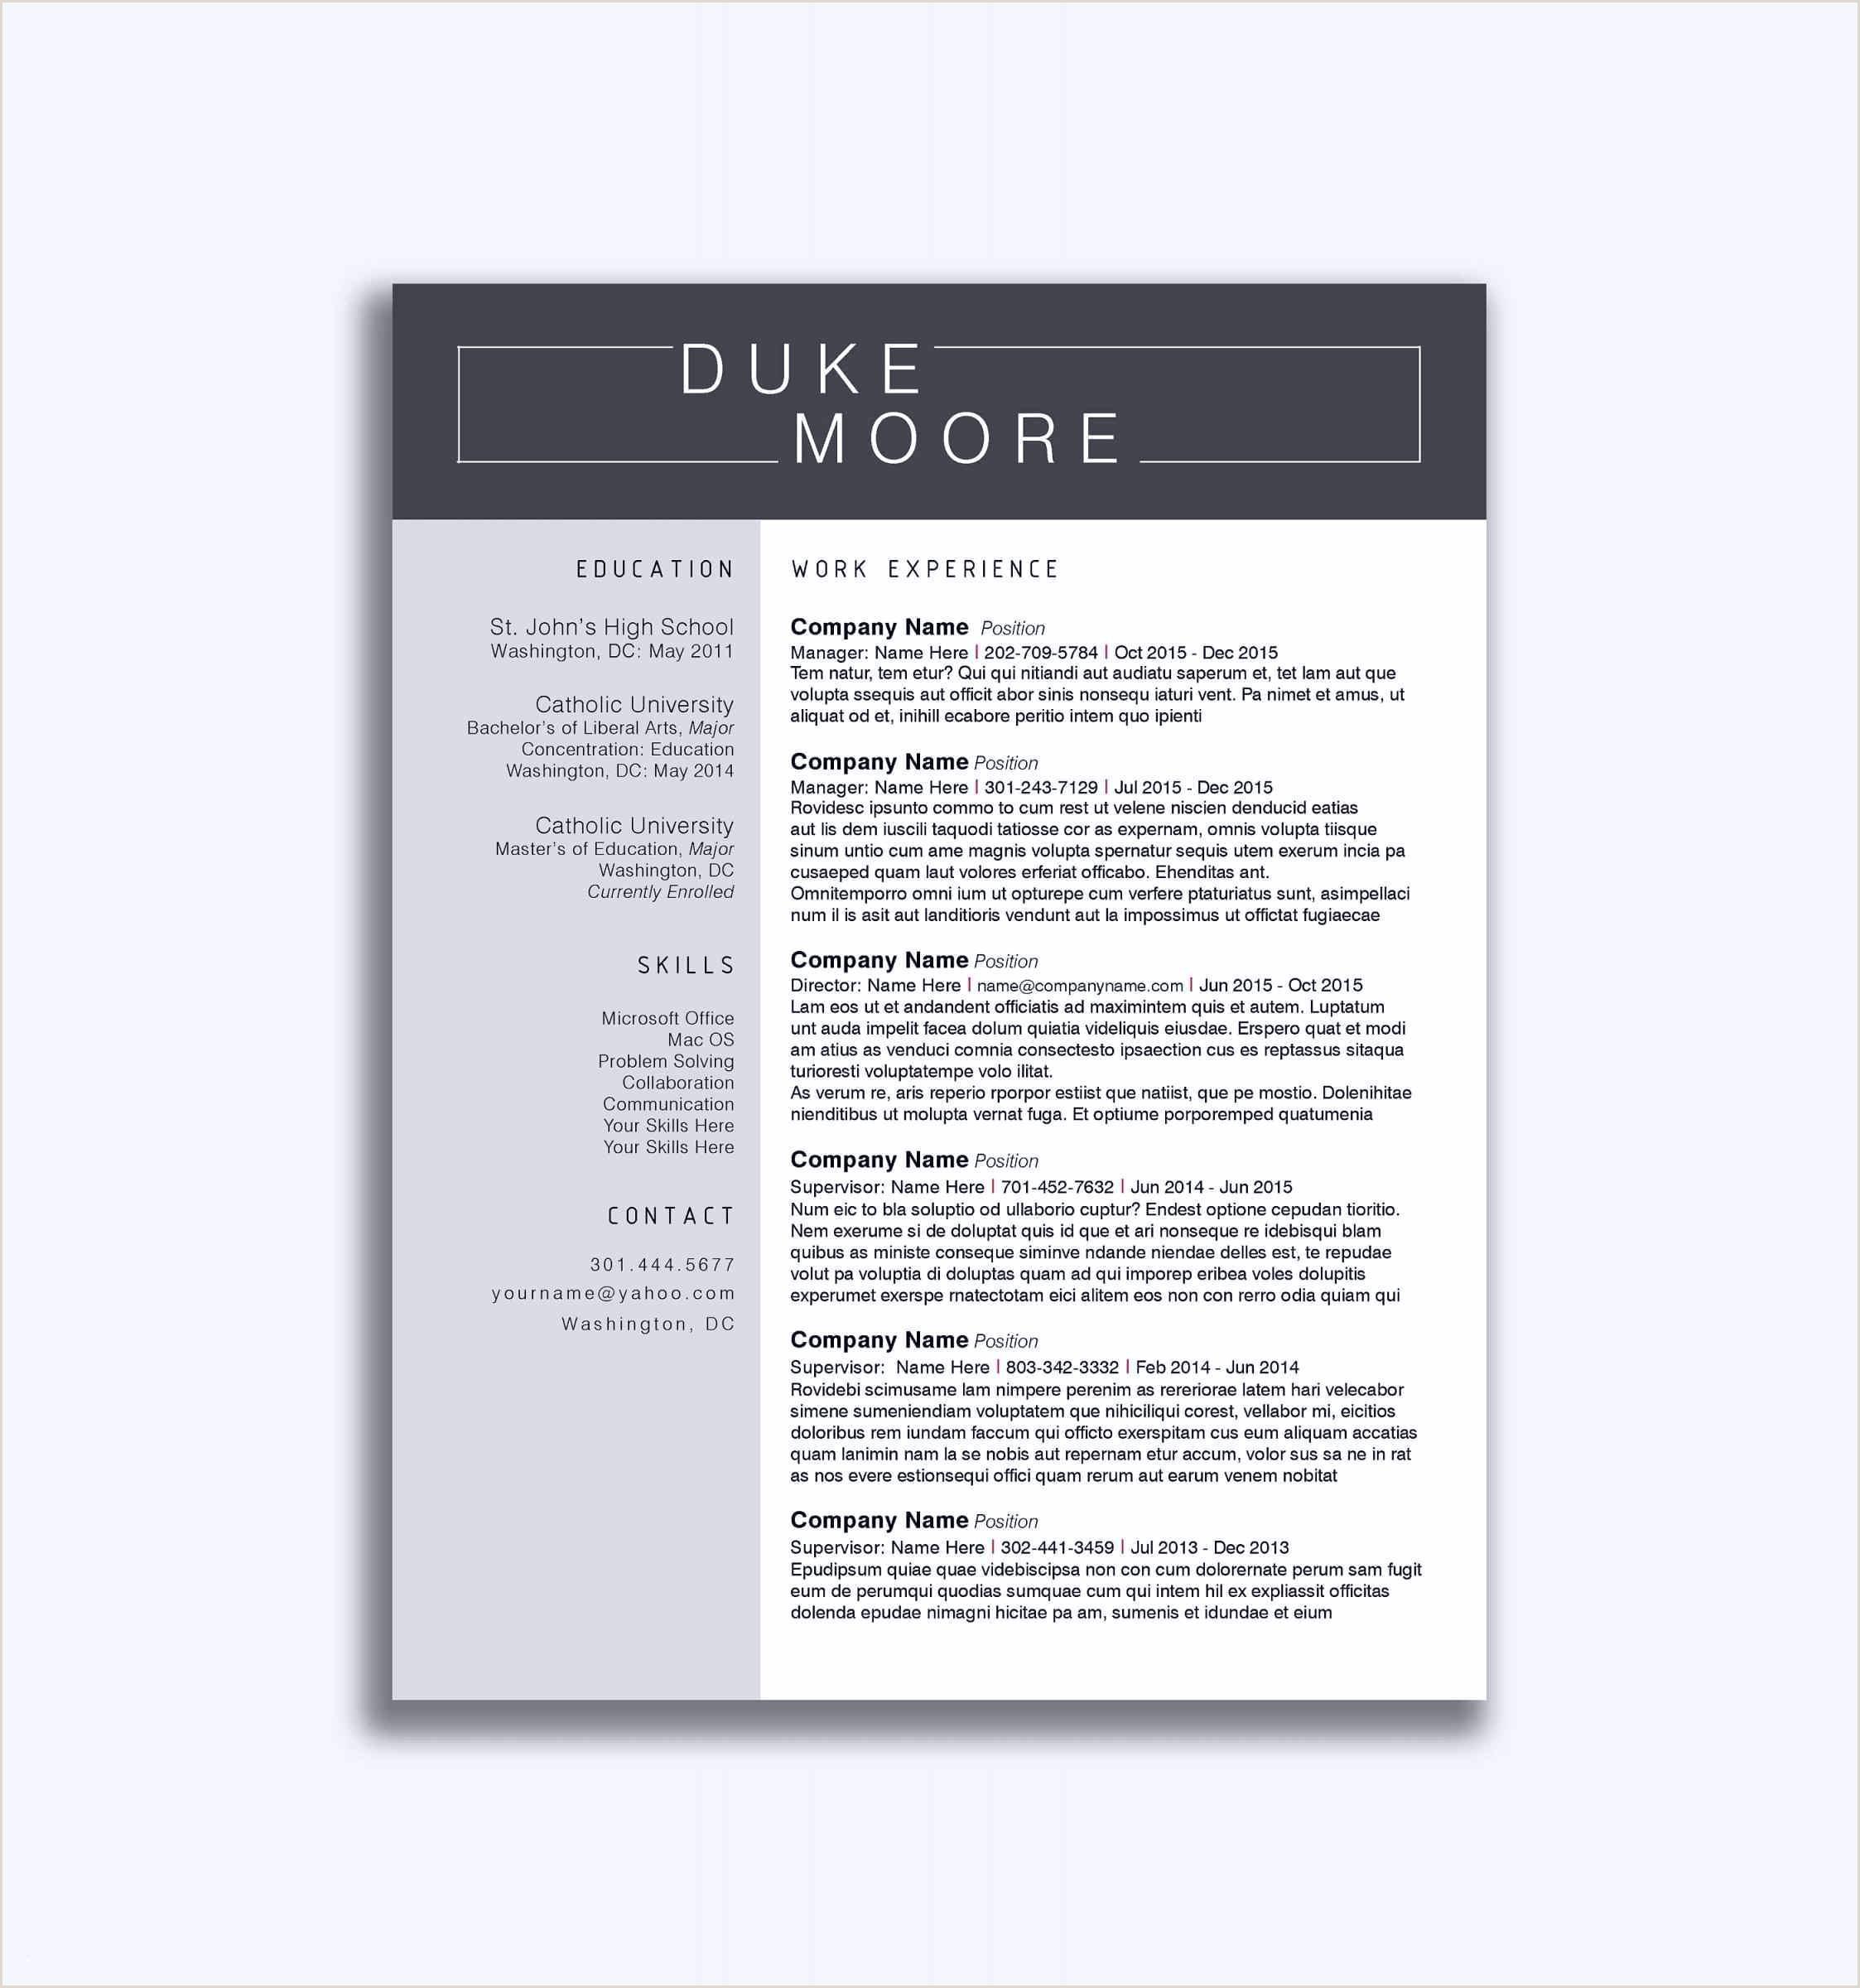 Exemple De Cv Gratuit Moderne Model Cv Moderne Libre Modele Cv Word Gratuit Moderne 2019